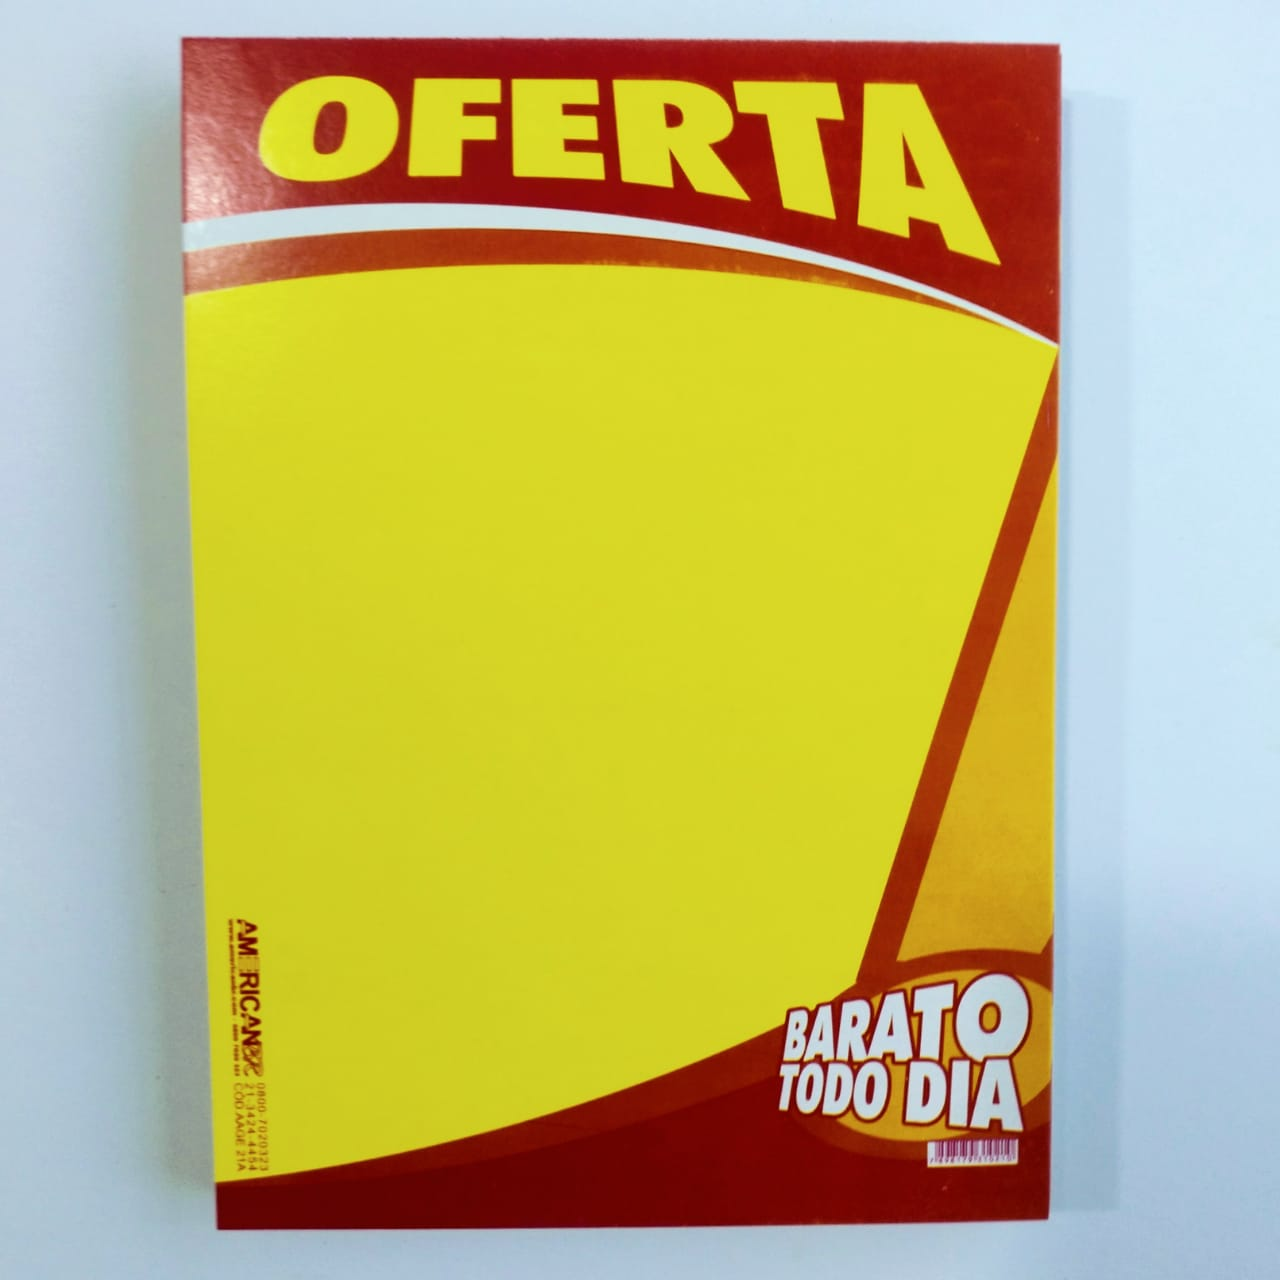 CARTAZ OFERTA BARATO TODO DIA 15X20CM (C/50 UNIDADES)